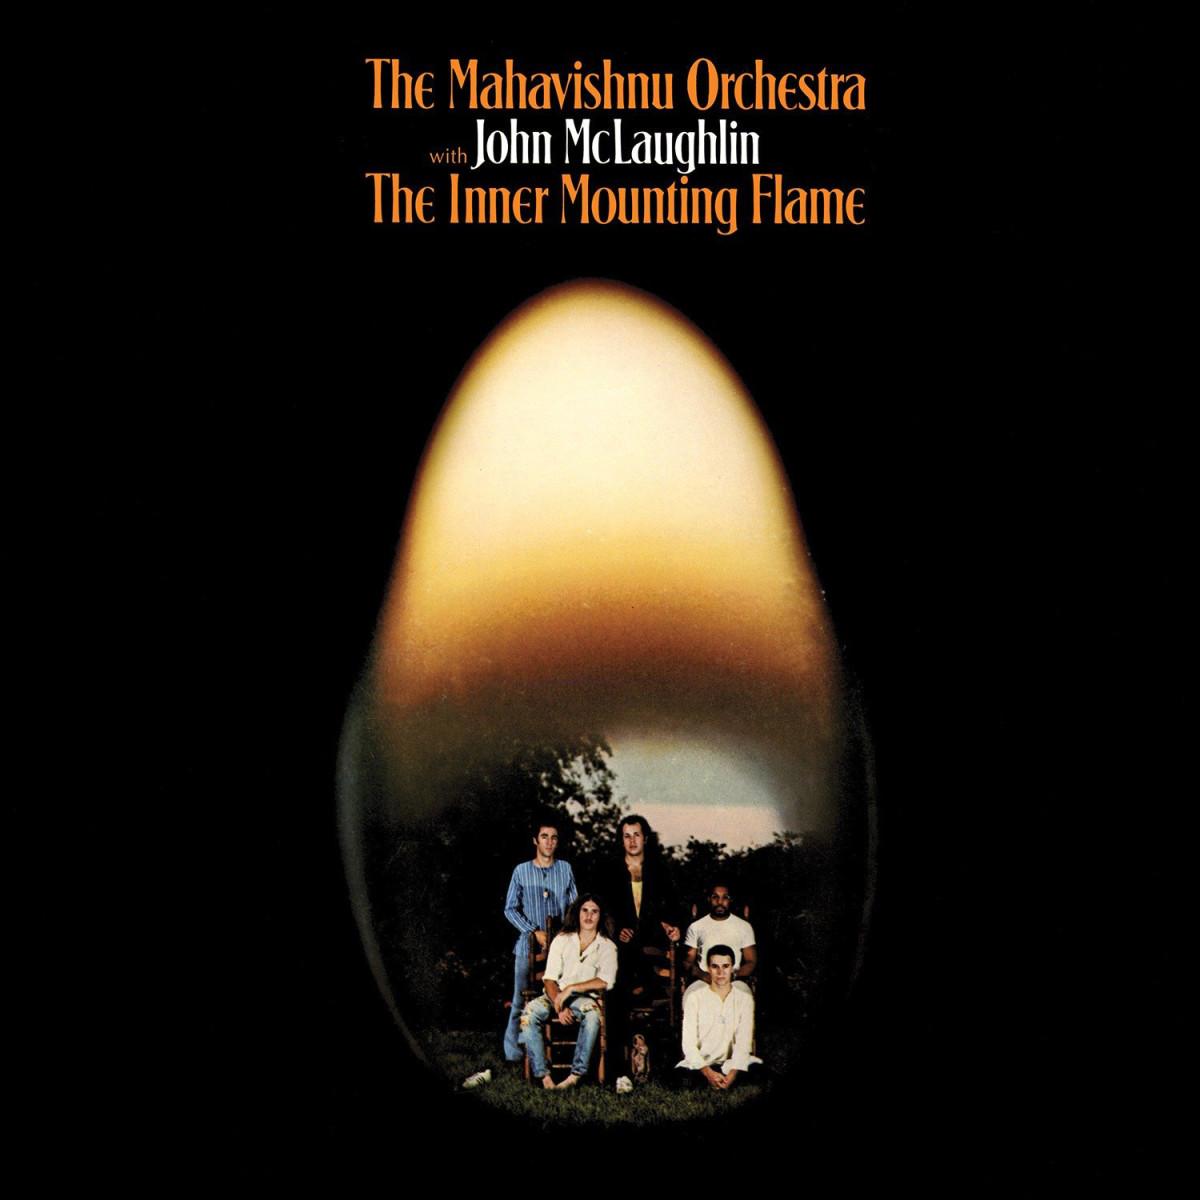 Mahavishnu Orchestra with John McLaughlin, The Inner Mounting Flame